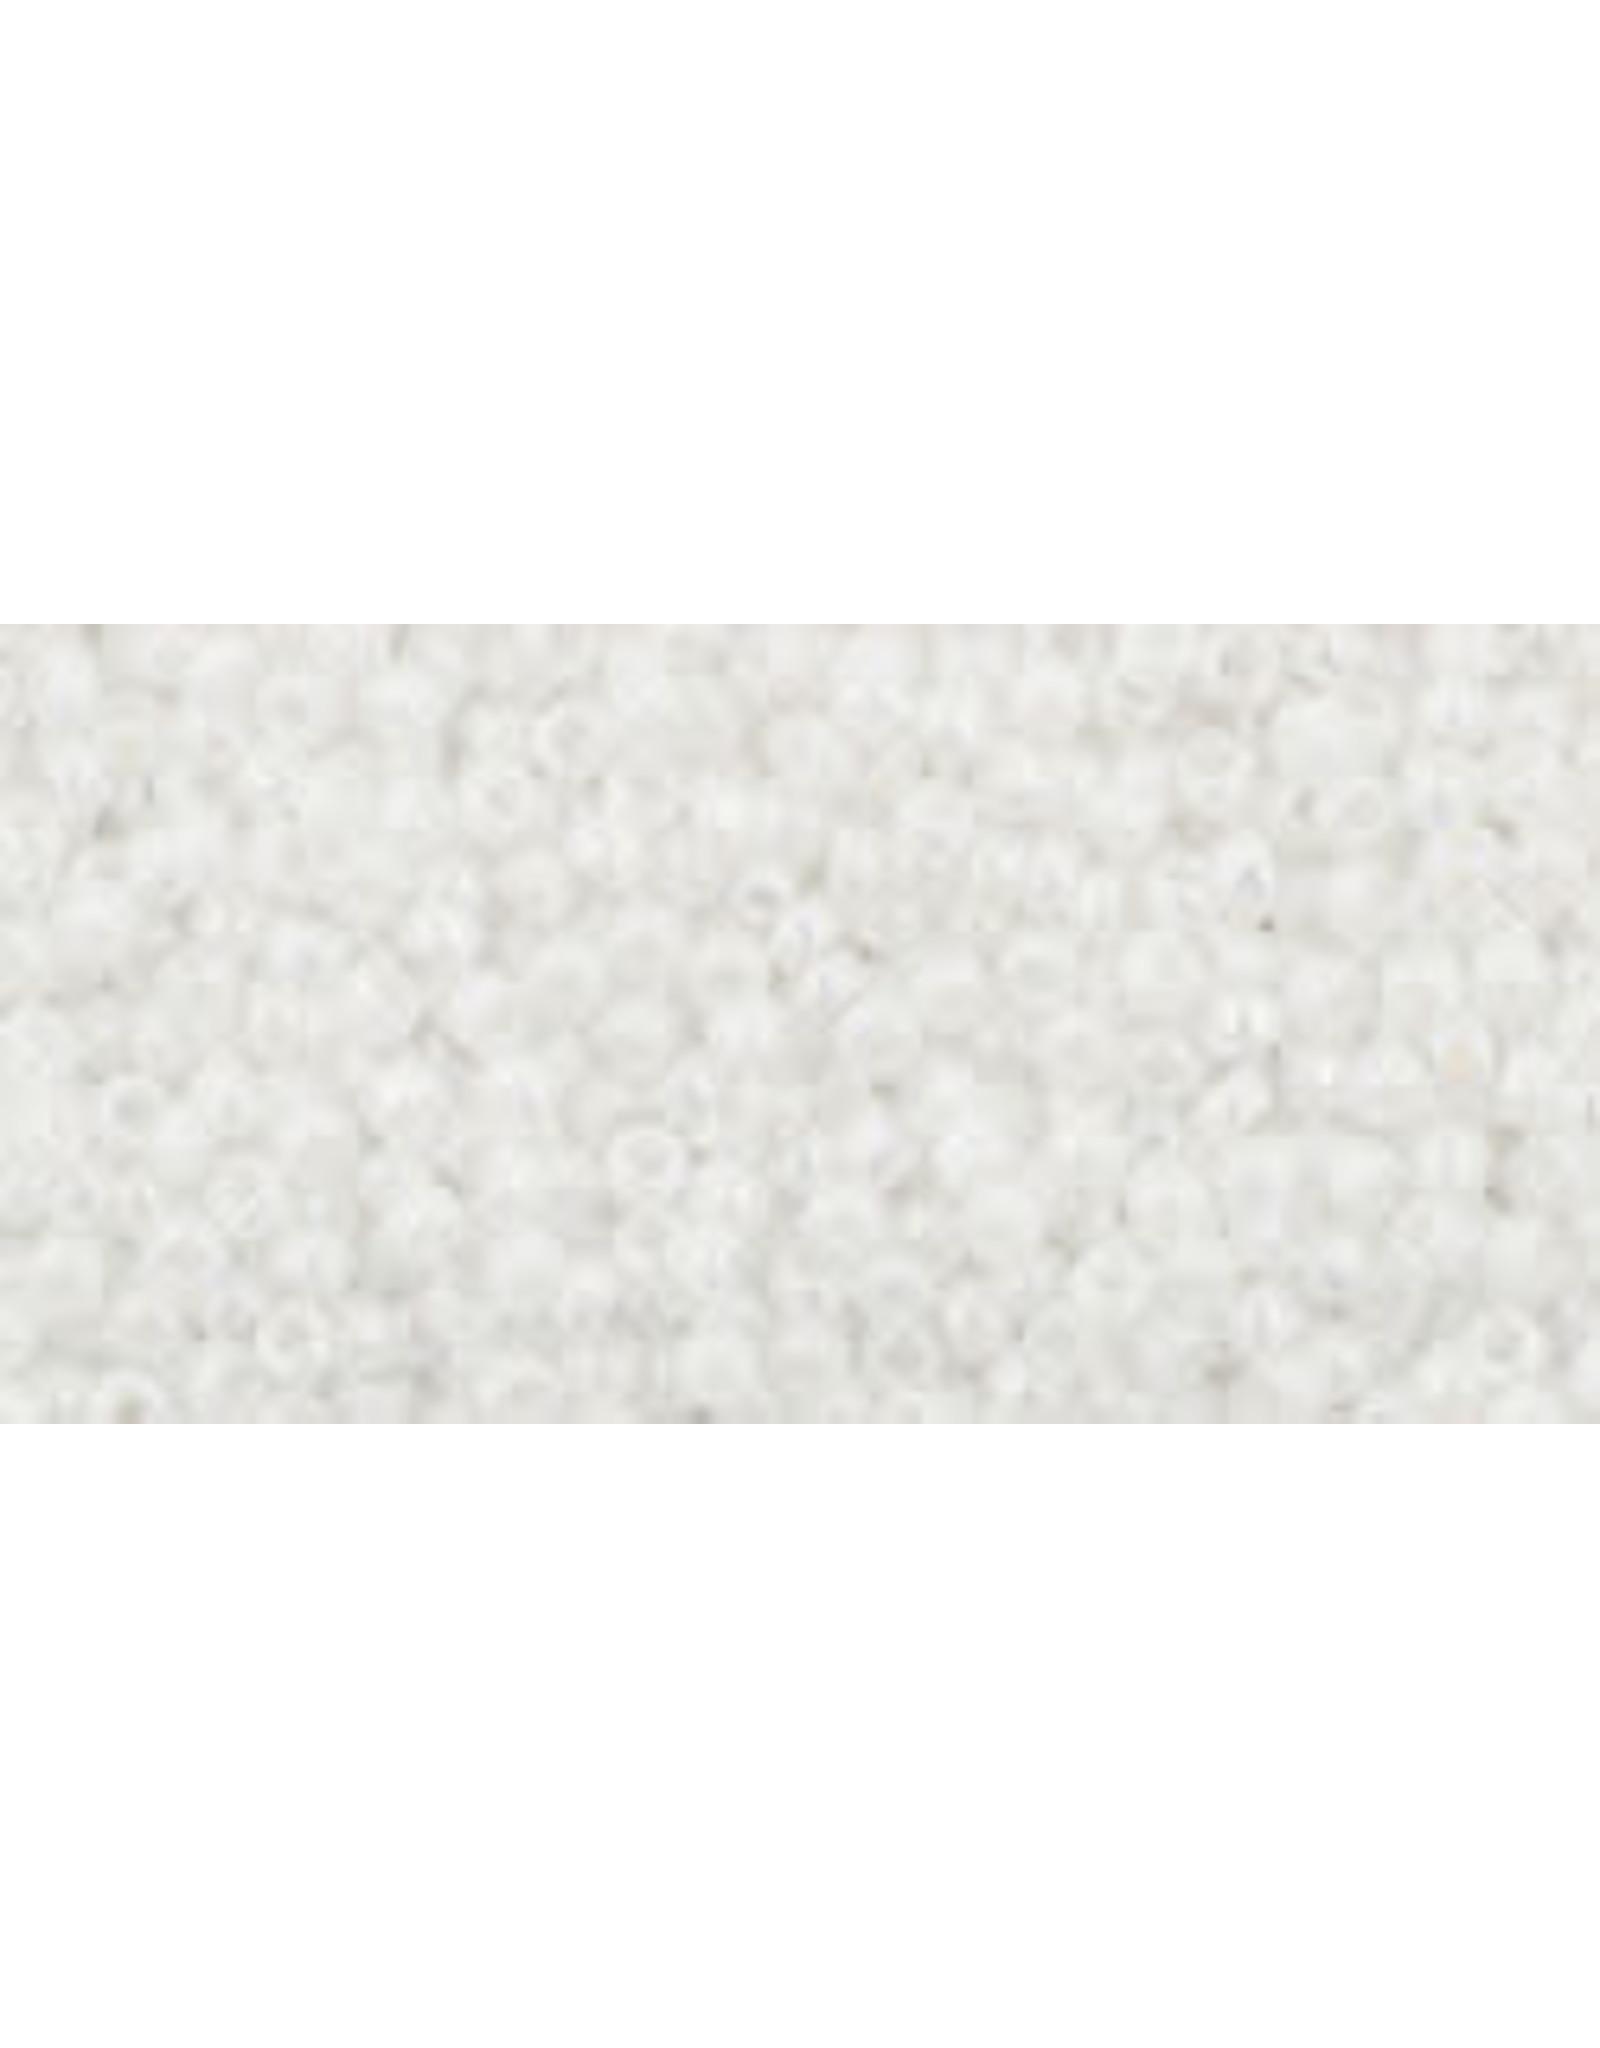 Toho 401  15  Seed 6g Opaque White AB